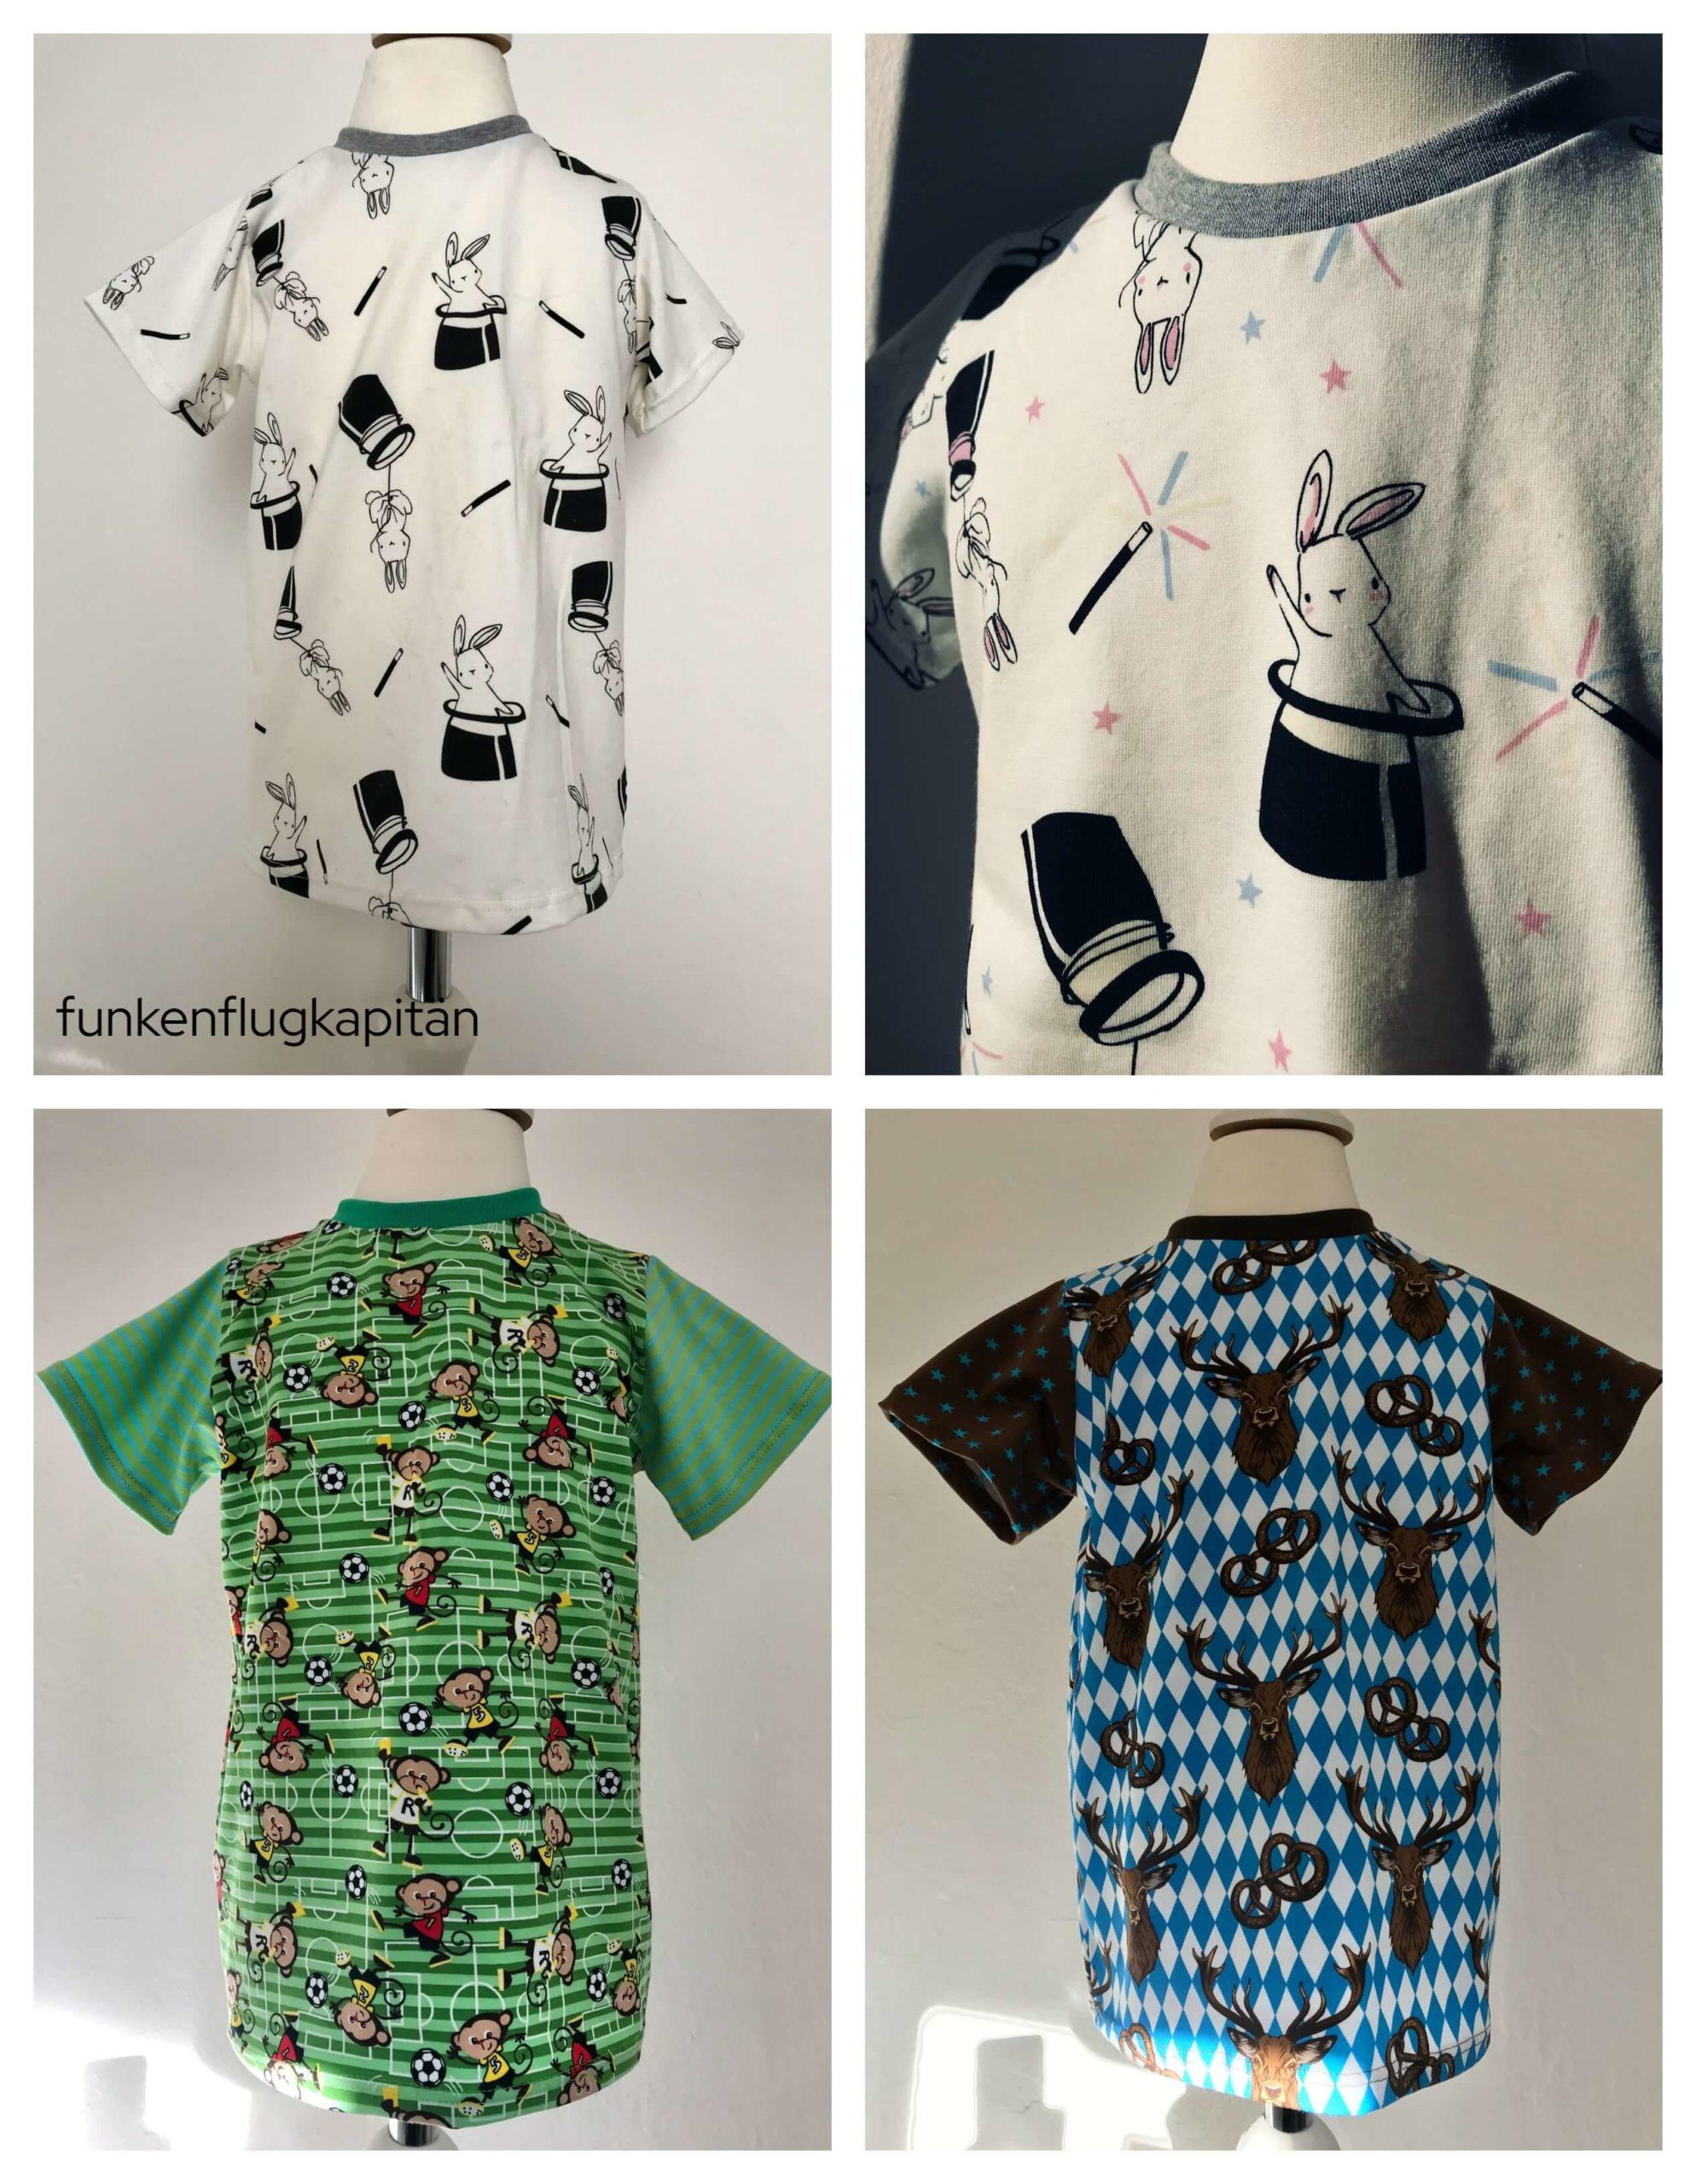 Kinder Shirts Jersey Basic Shirt Lybstes 2